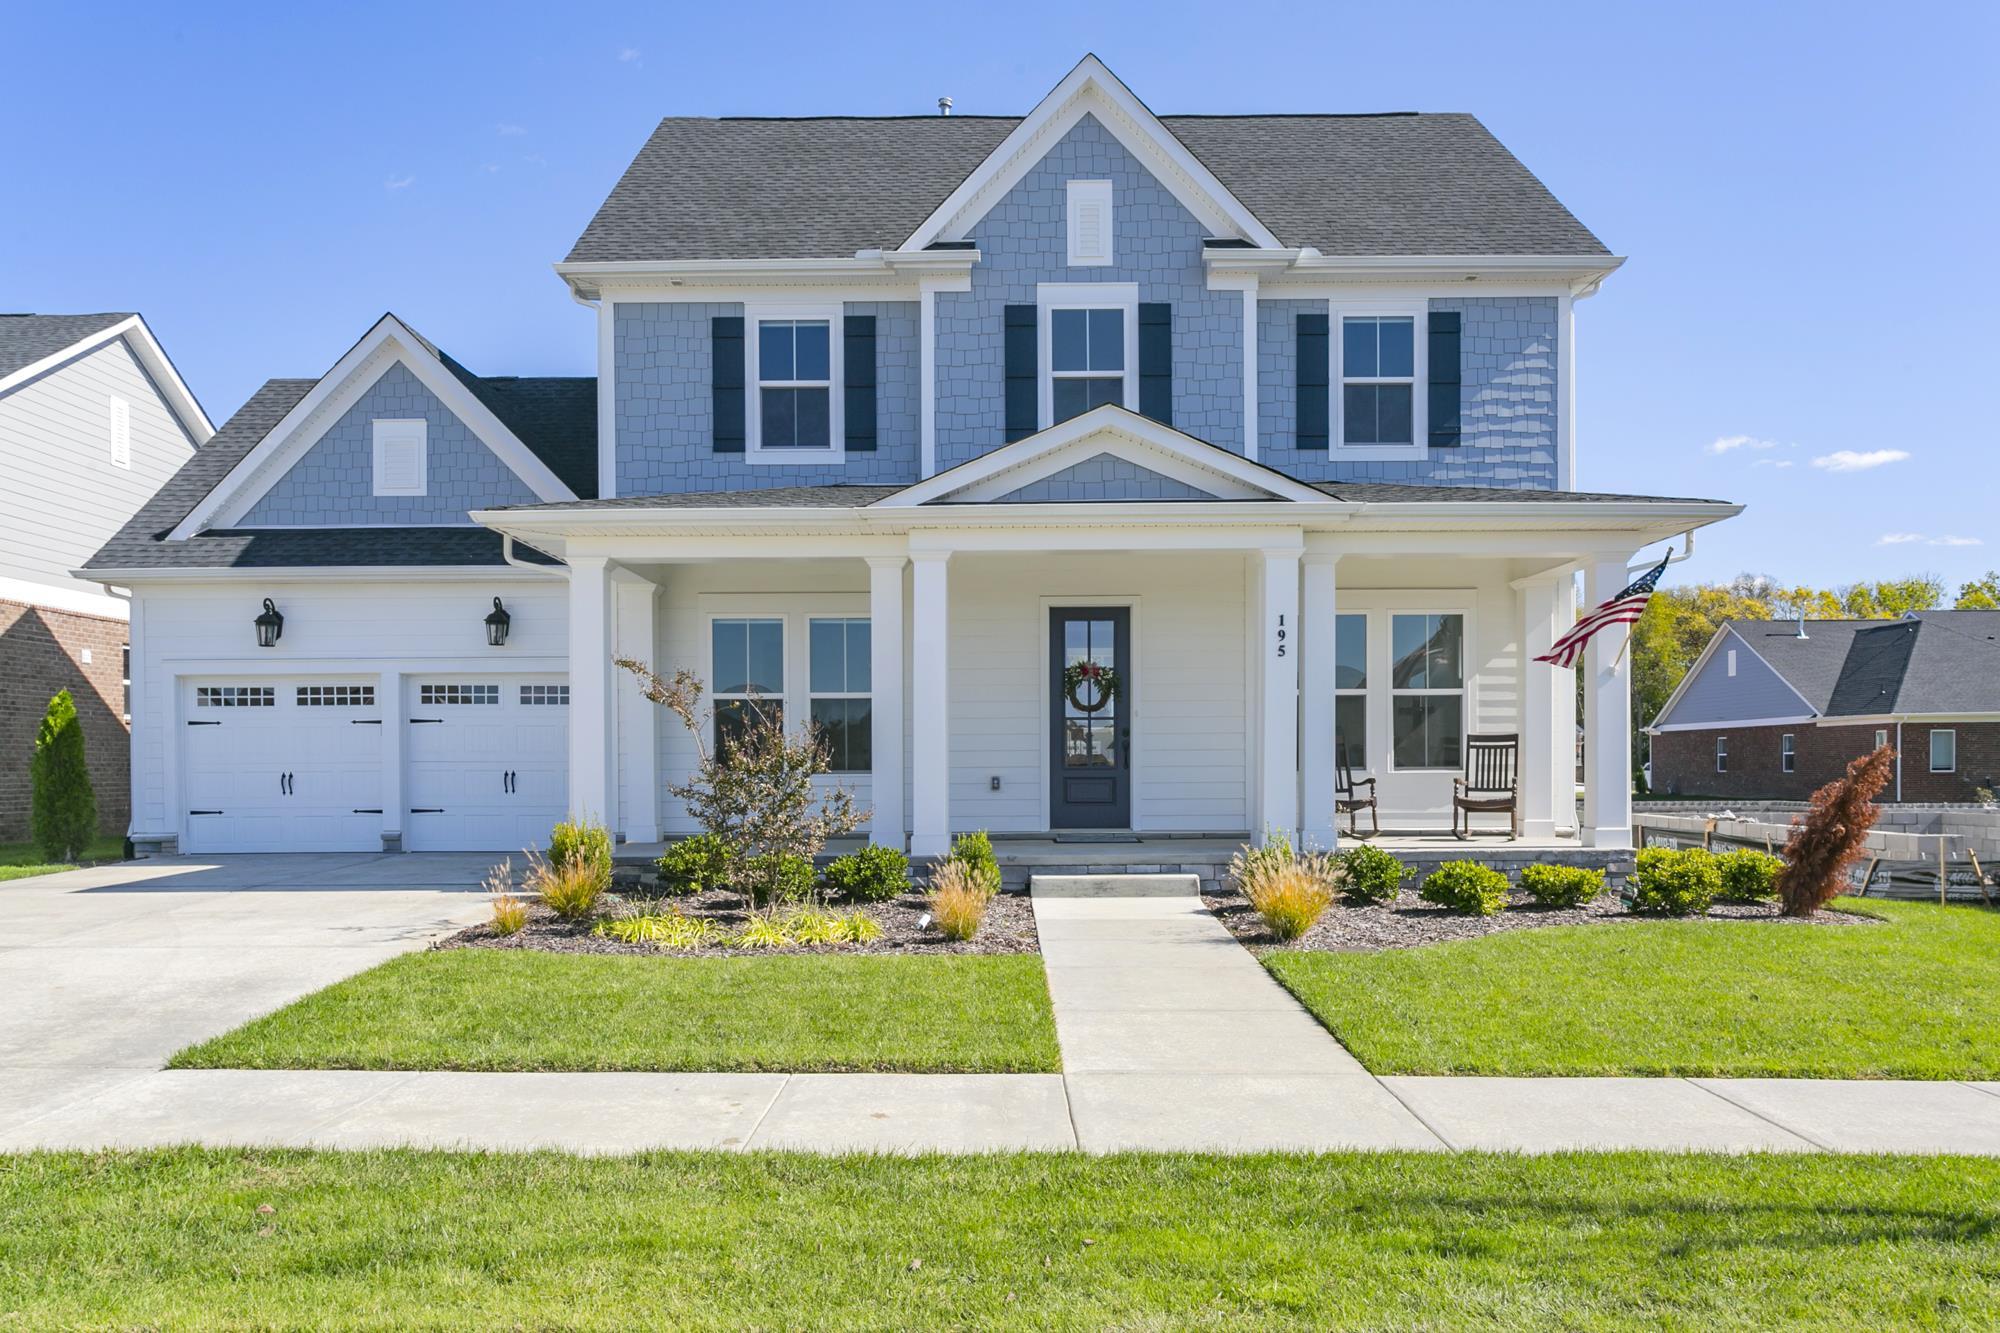 195 Ashington Circle, Hendersonville, TN 37075 - Hendersonville, TN real estate listing